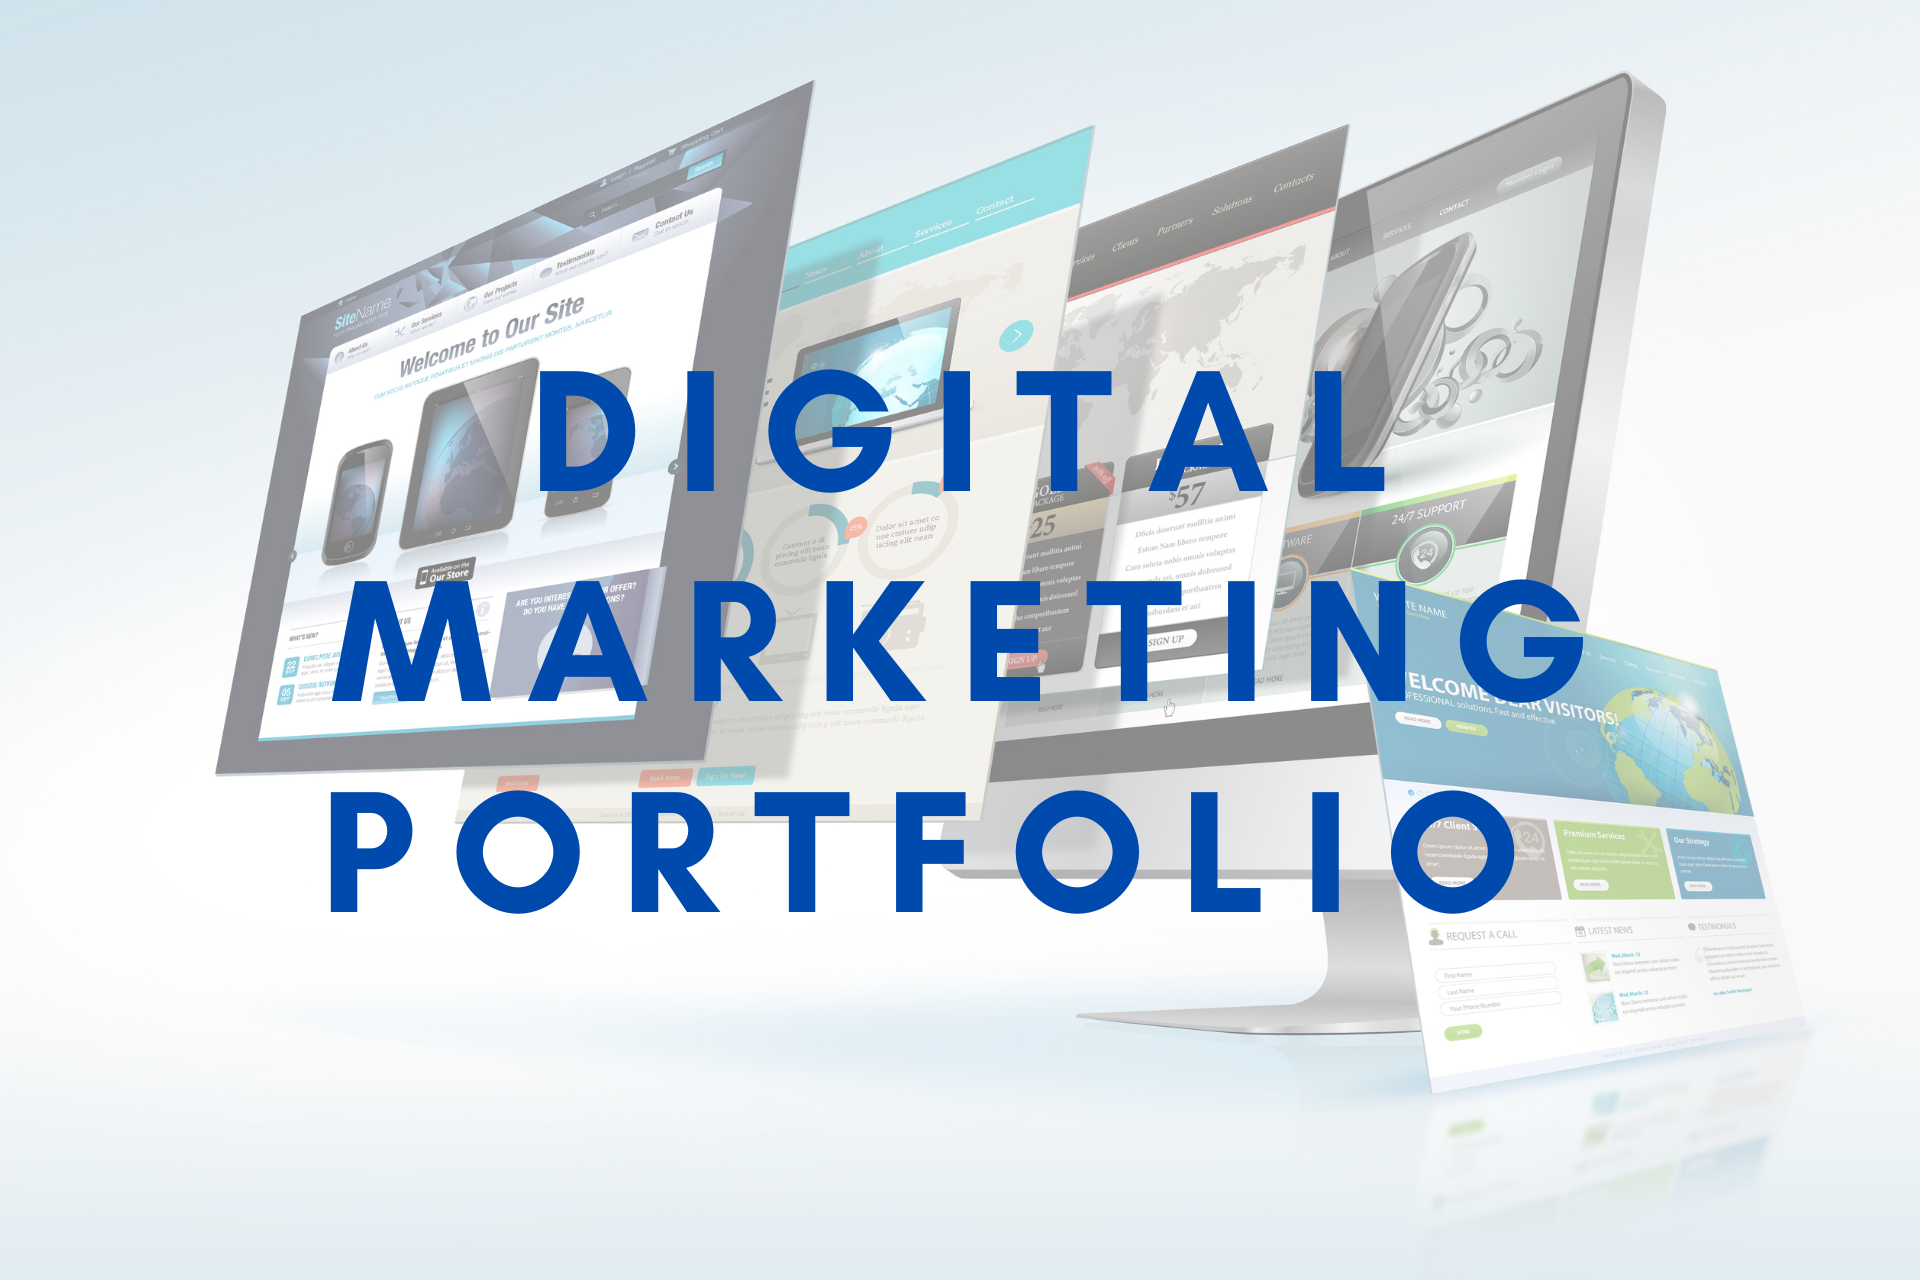 Digital marketing portfolio